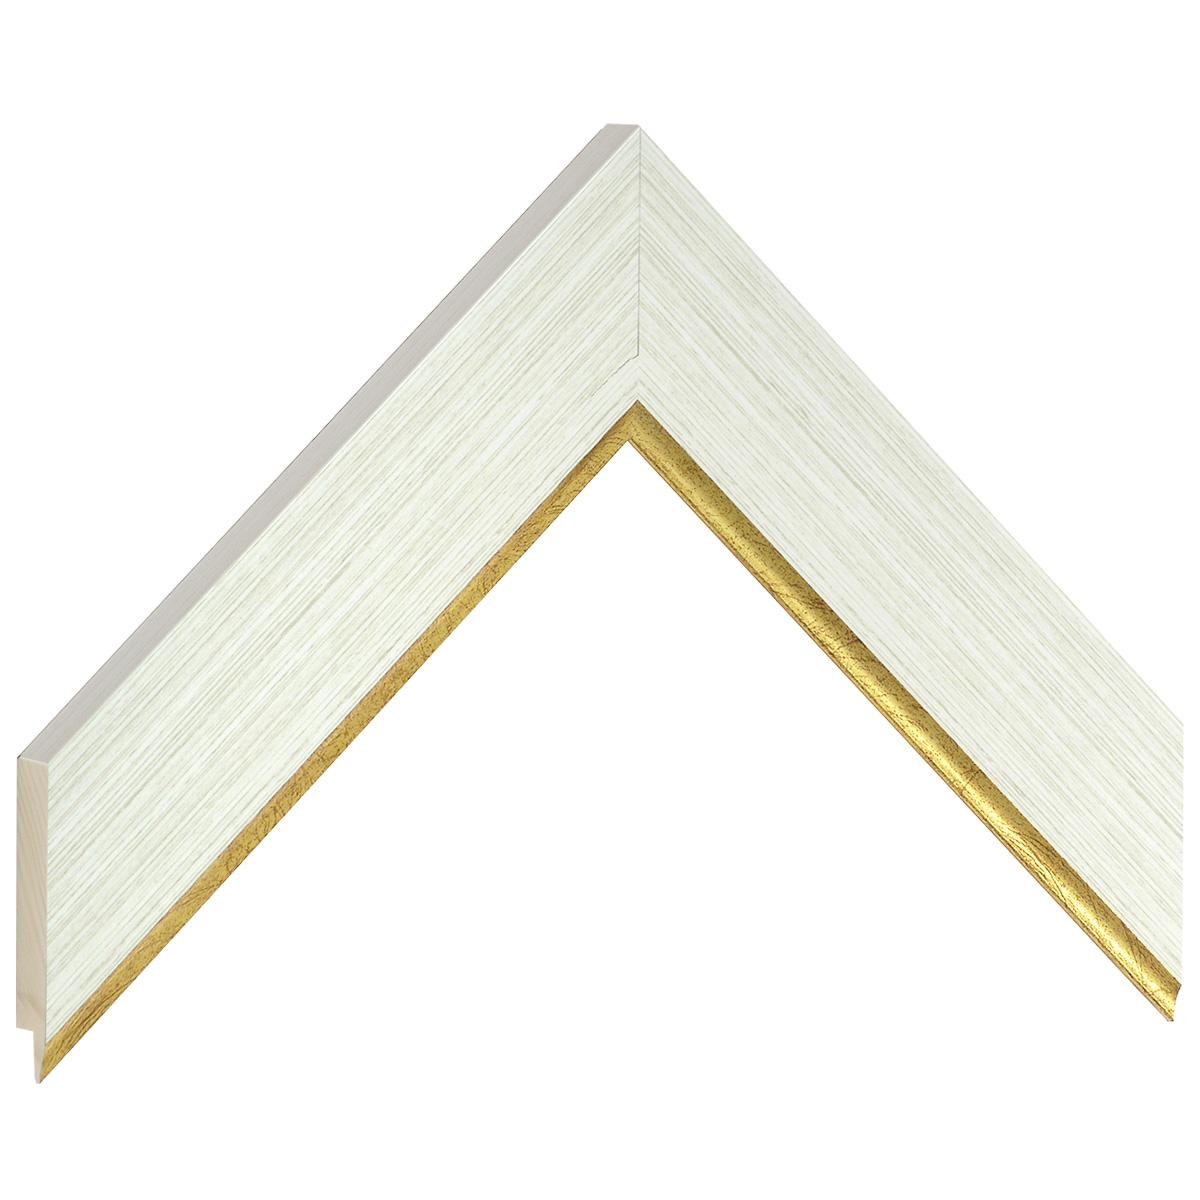 Liner finger-joint pine 38mm - ivory, gold sight edge